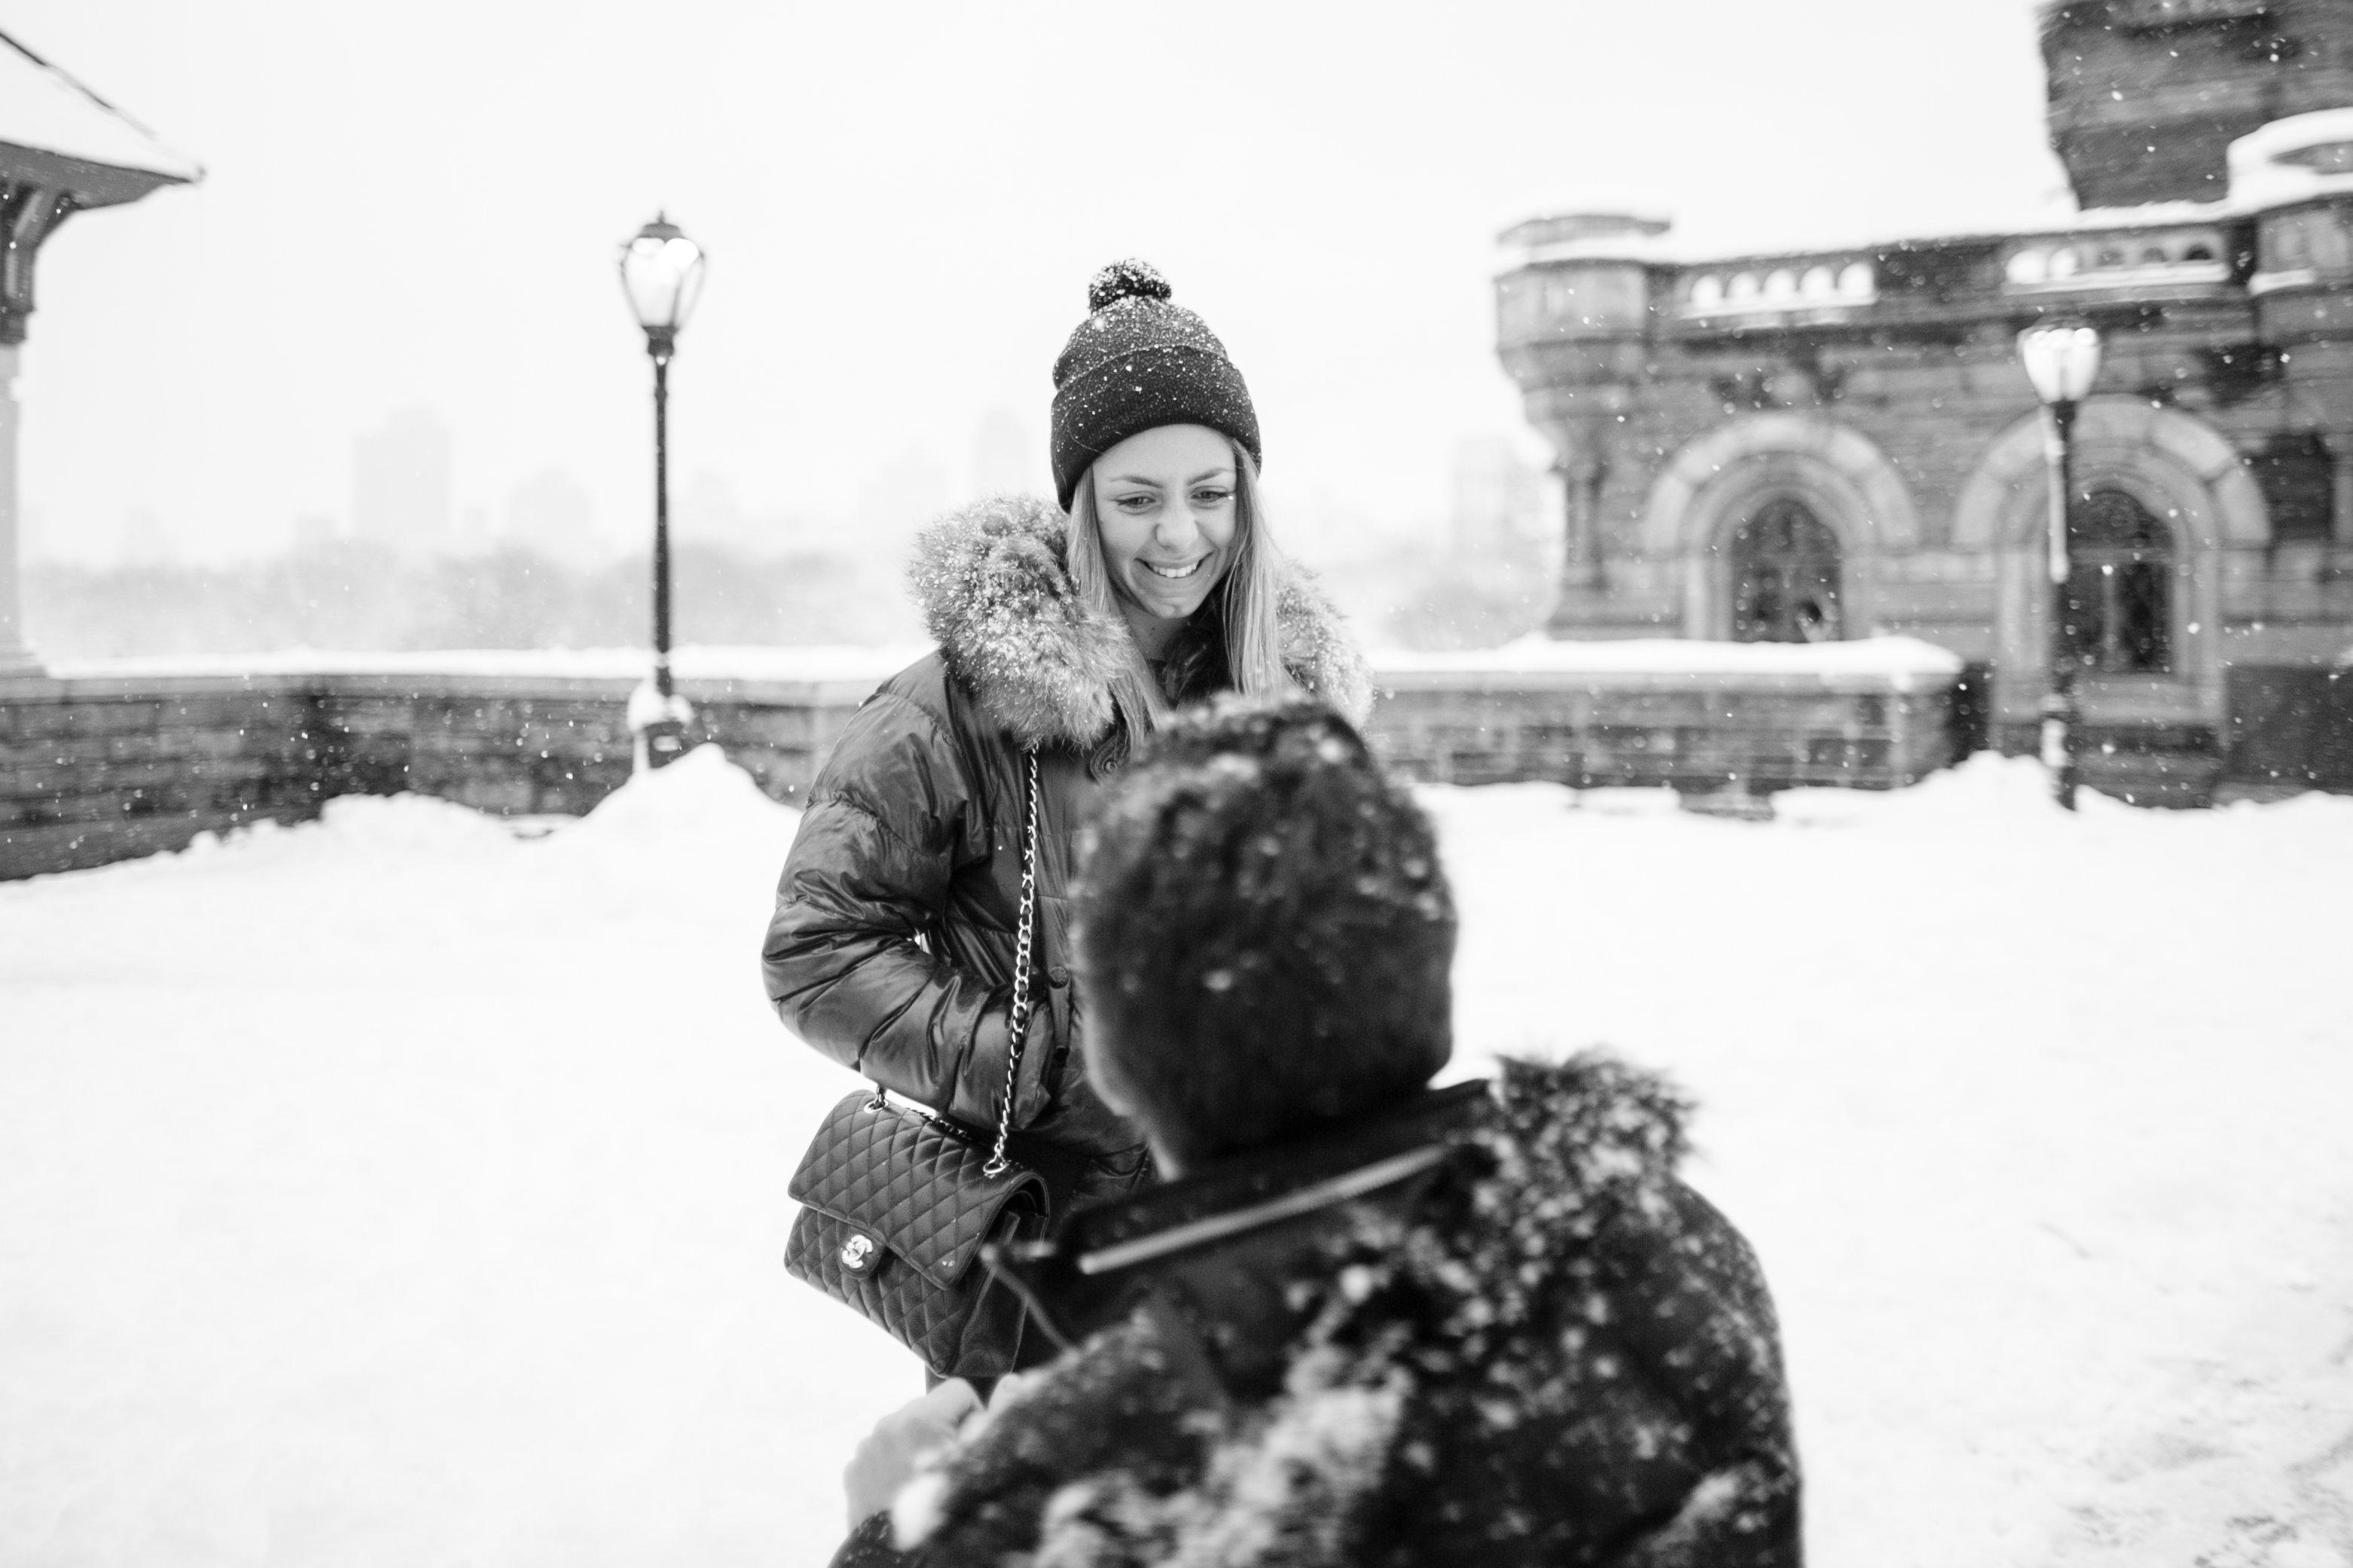 new-york-winter-proposal-idea-2.jpg